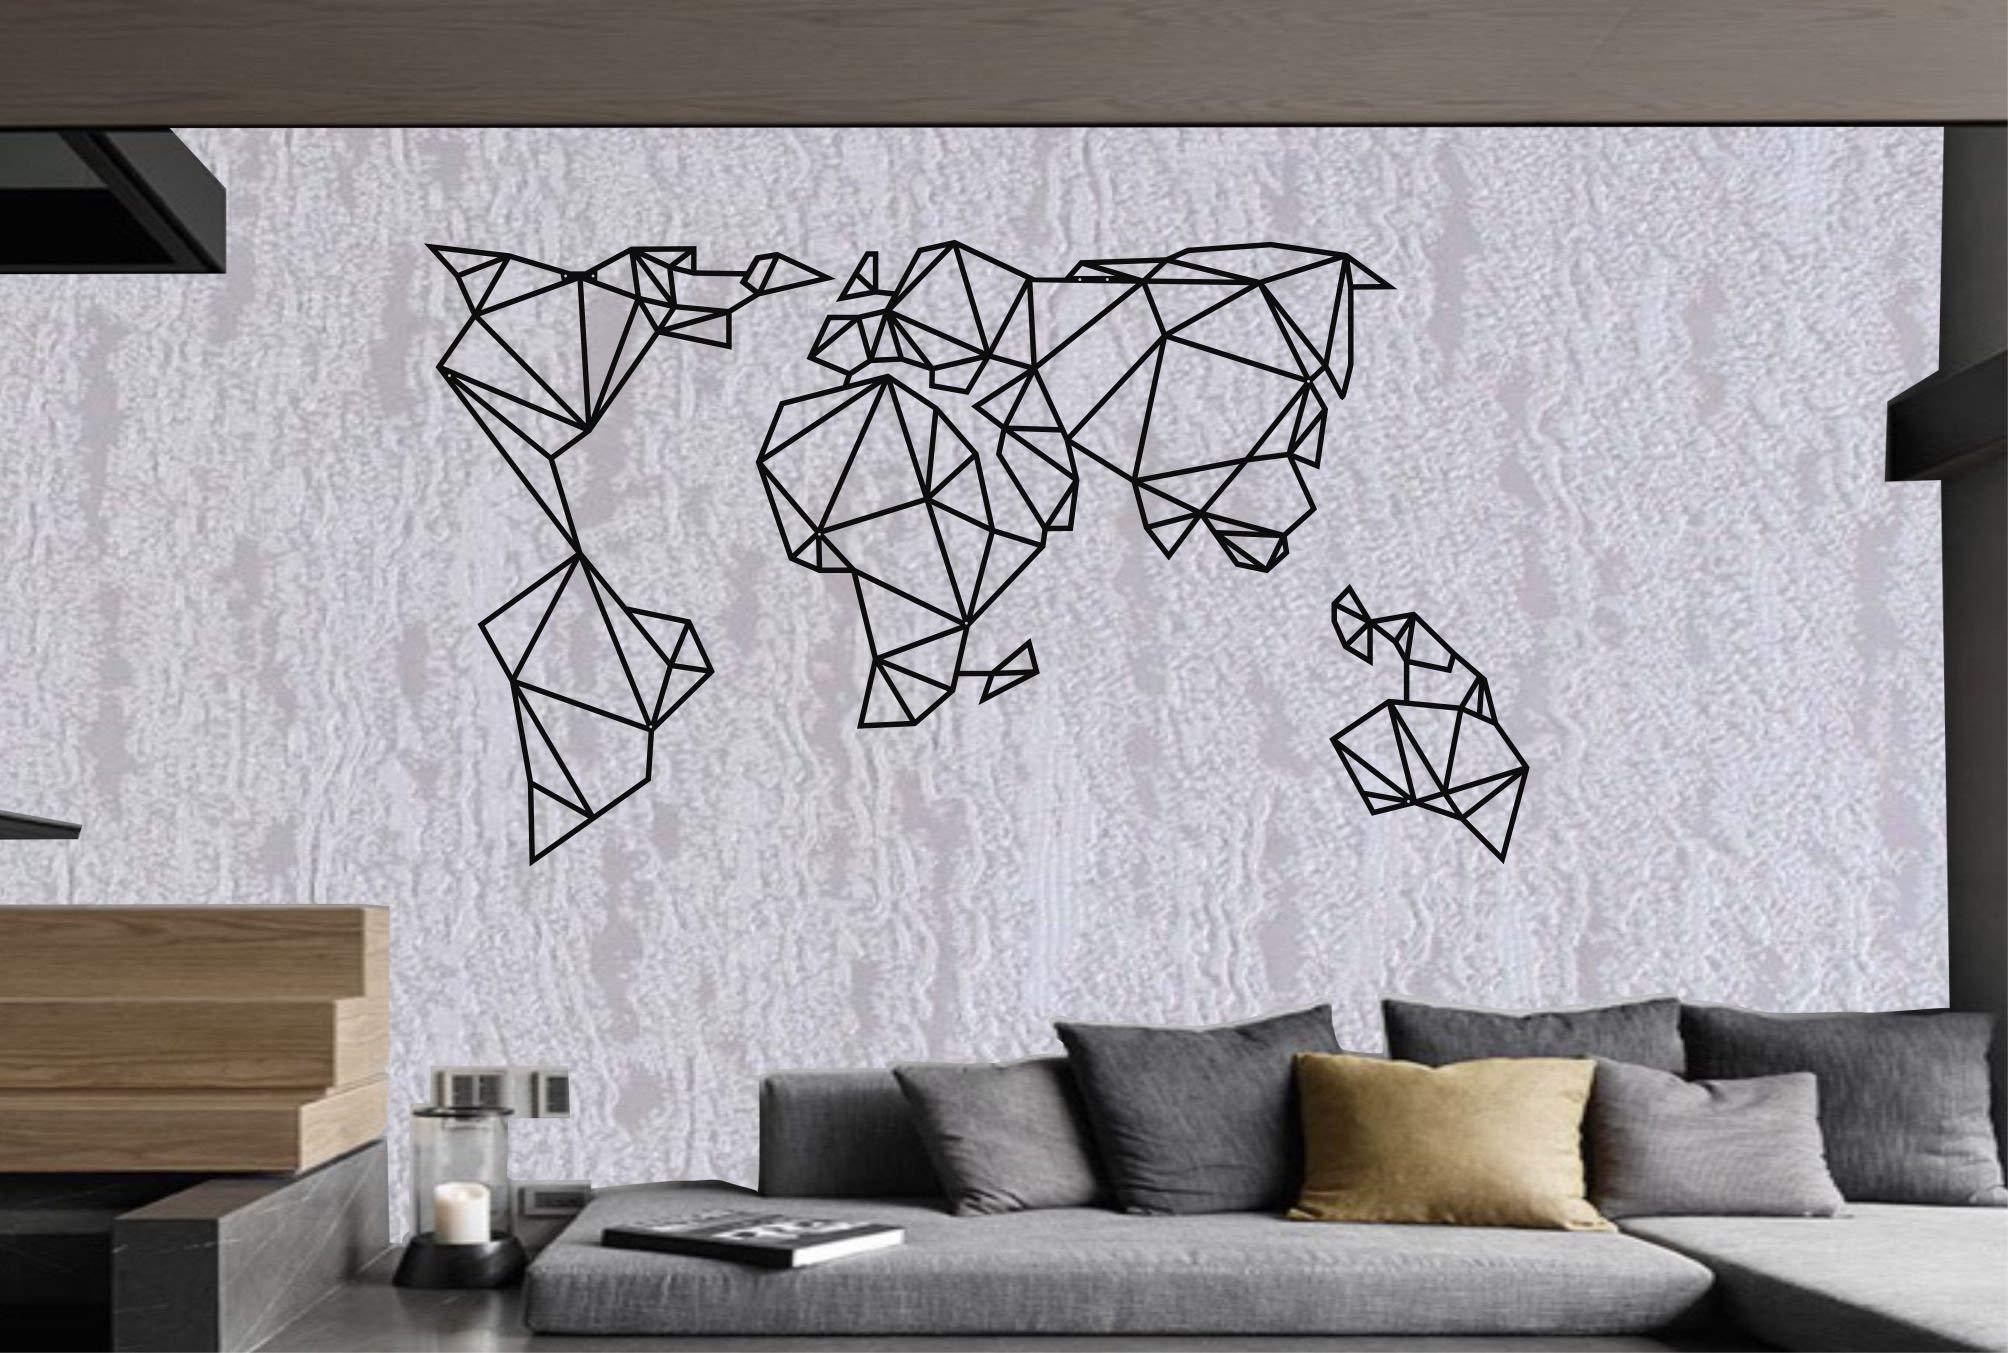 Metal World Map Wall Art Geometric World Map 3d Wall Silhouette Metal Wall Decor Office Decoration Bedroom Living Room Decor 76x43cm Amazon Co Uk Kitchen Home